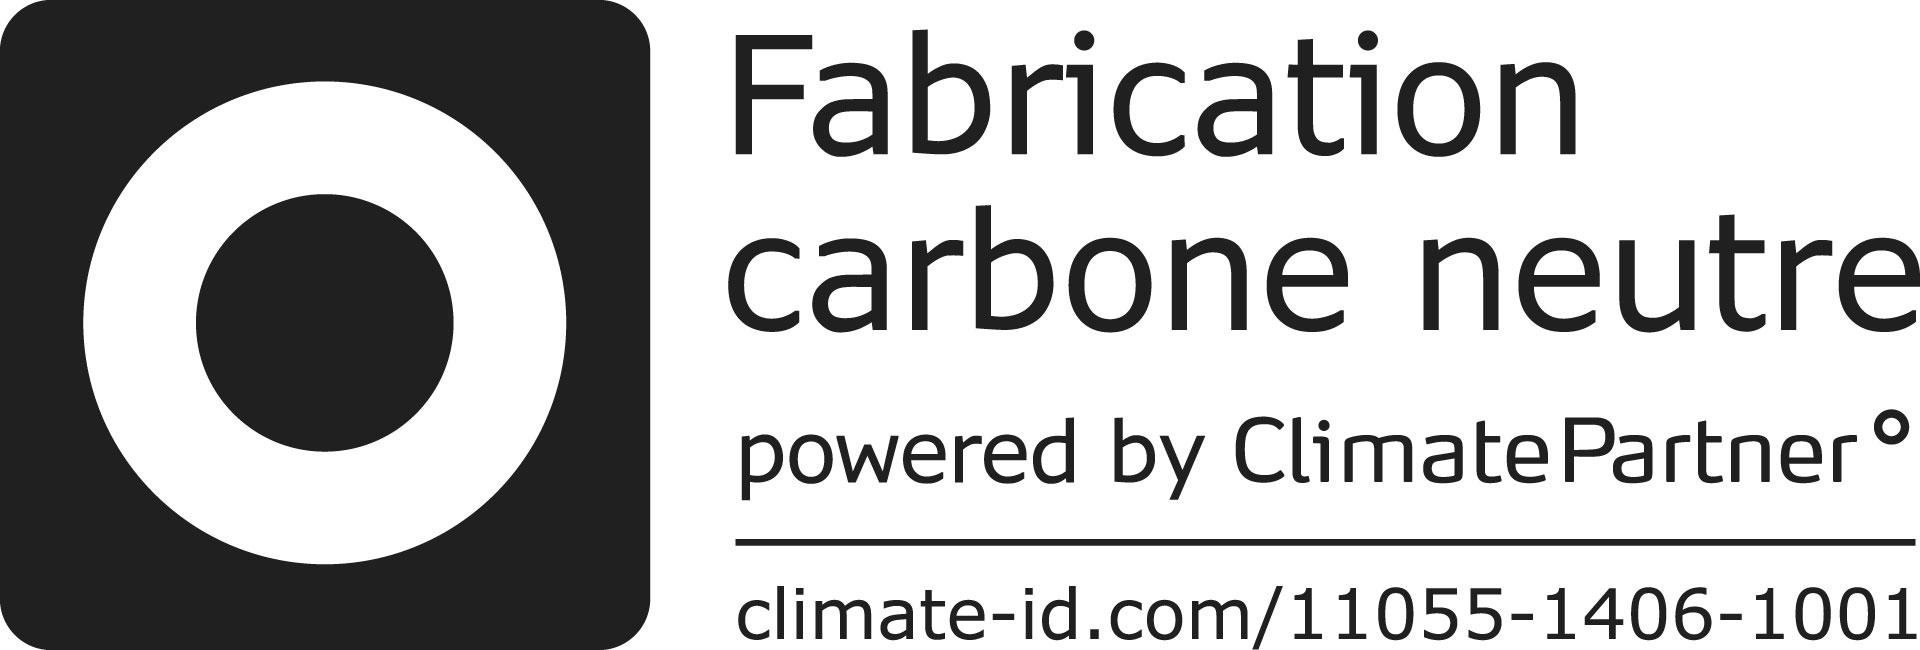 Fabrication carbone neutre